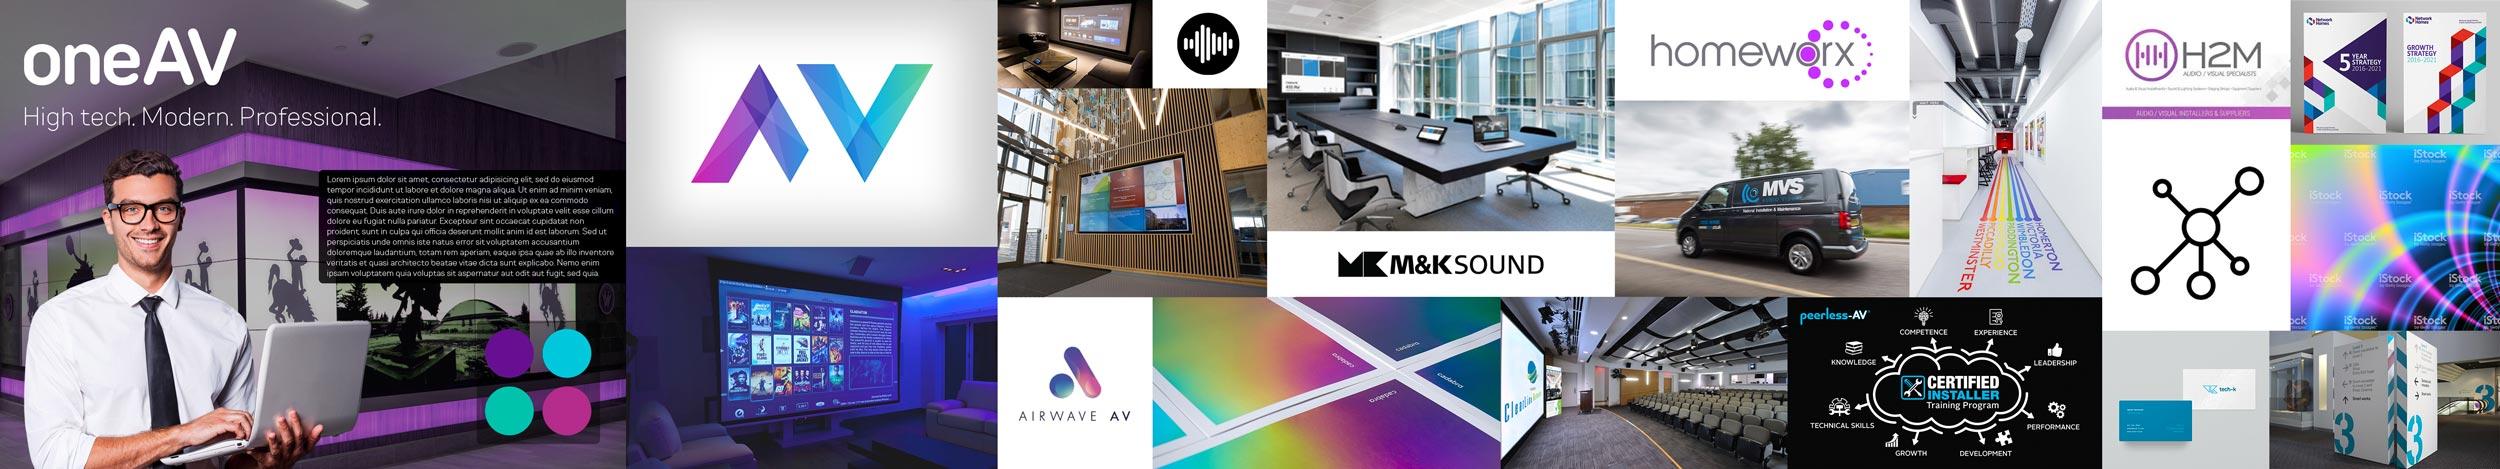 OneAV logo design project Stylescape